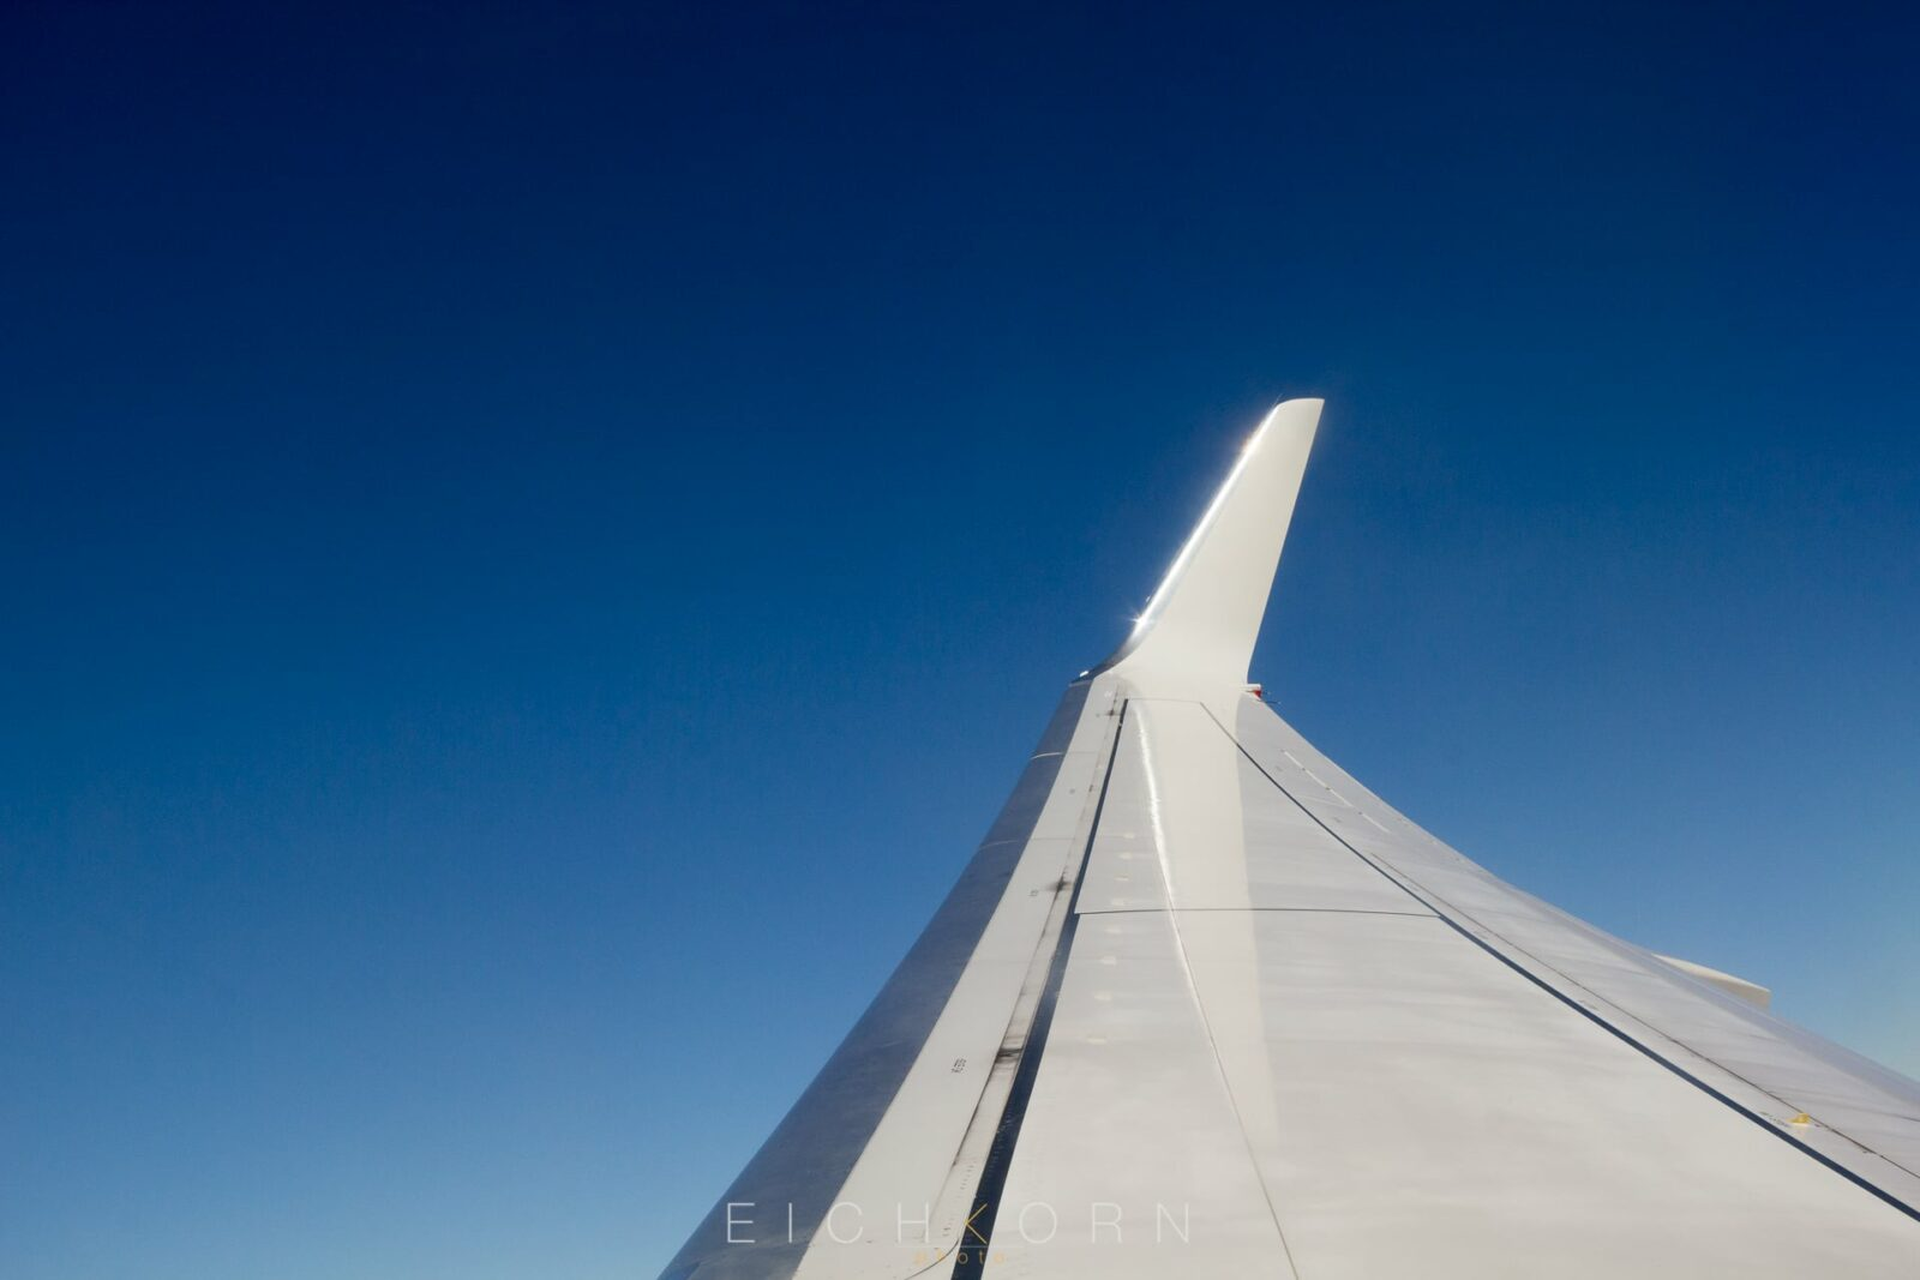 The journey begins – Munich to Dubai